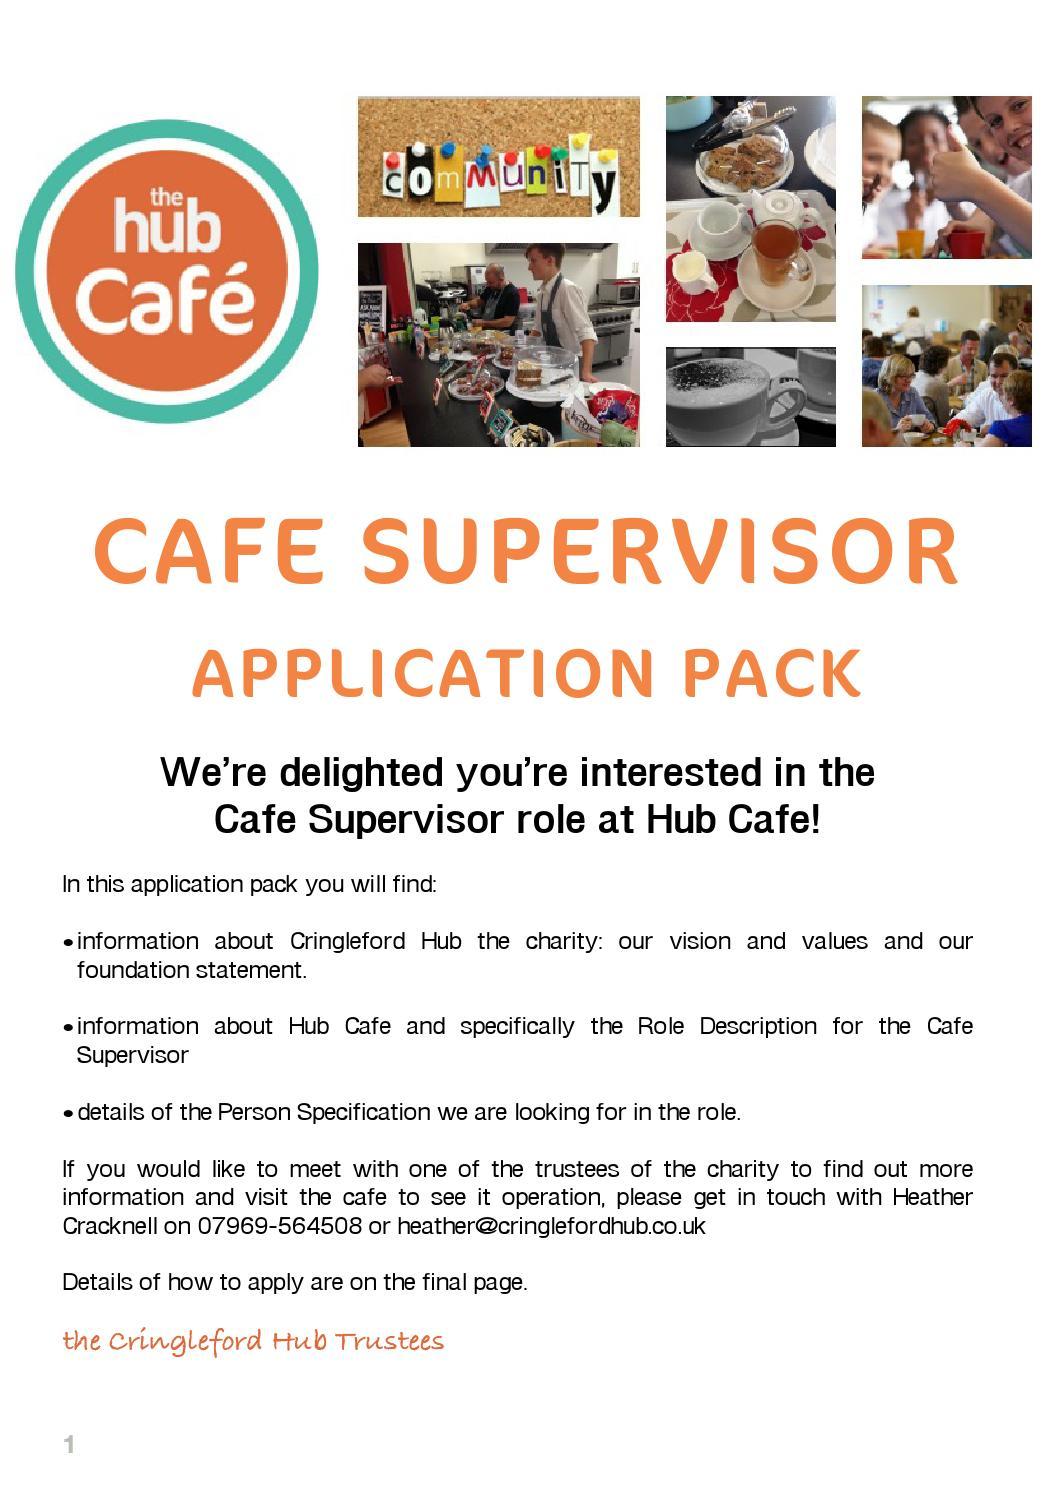 Hub cafe supervisor application pack by Cringleford Hub - issuu